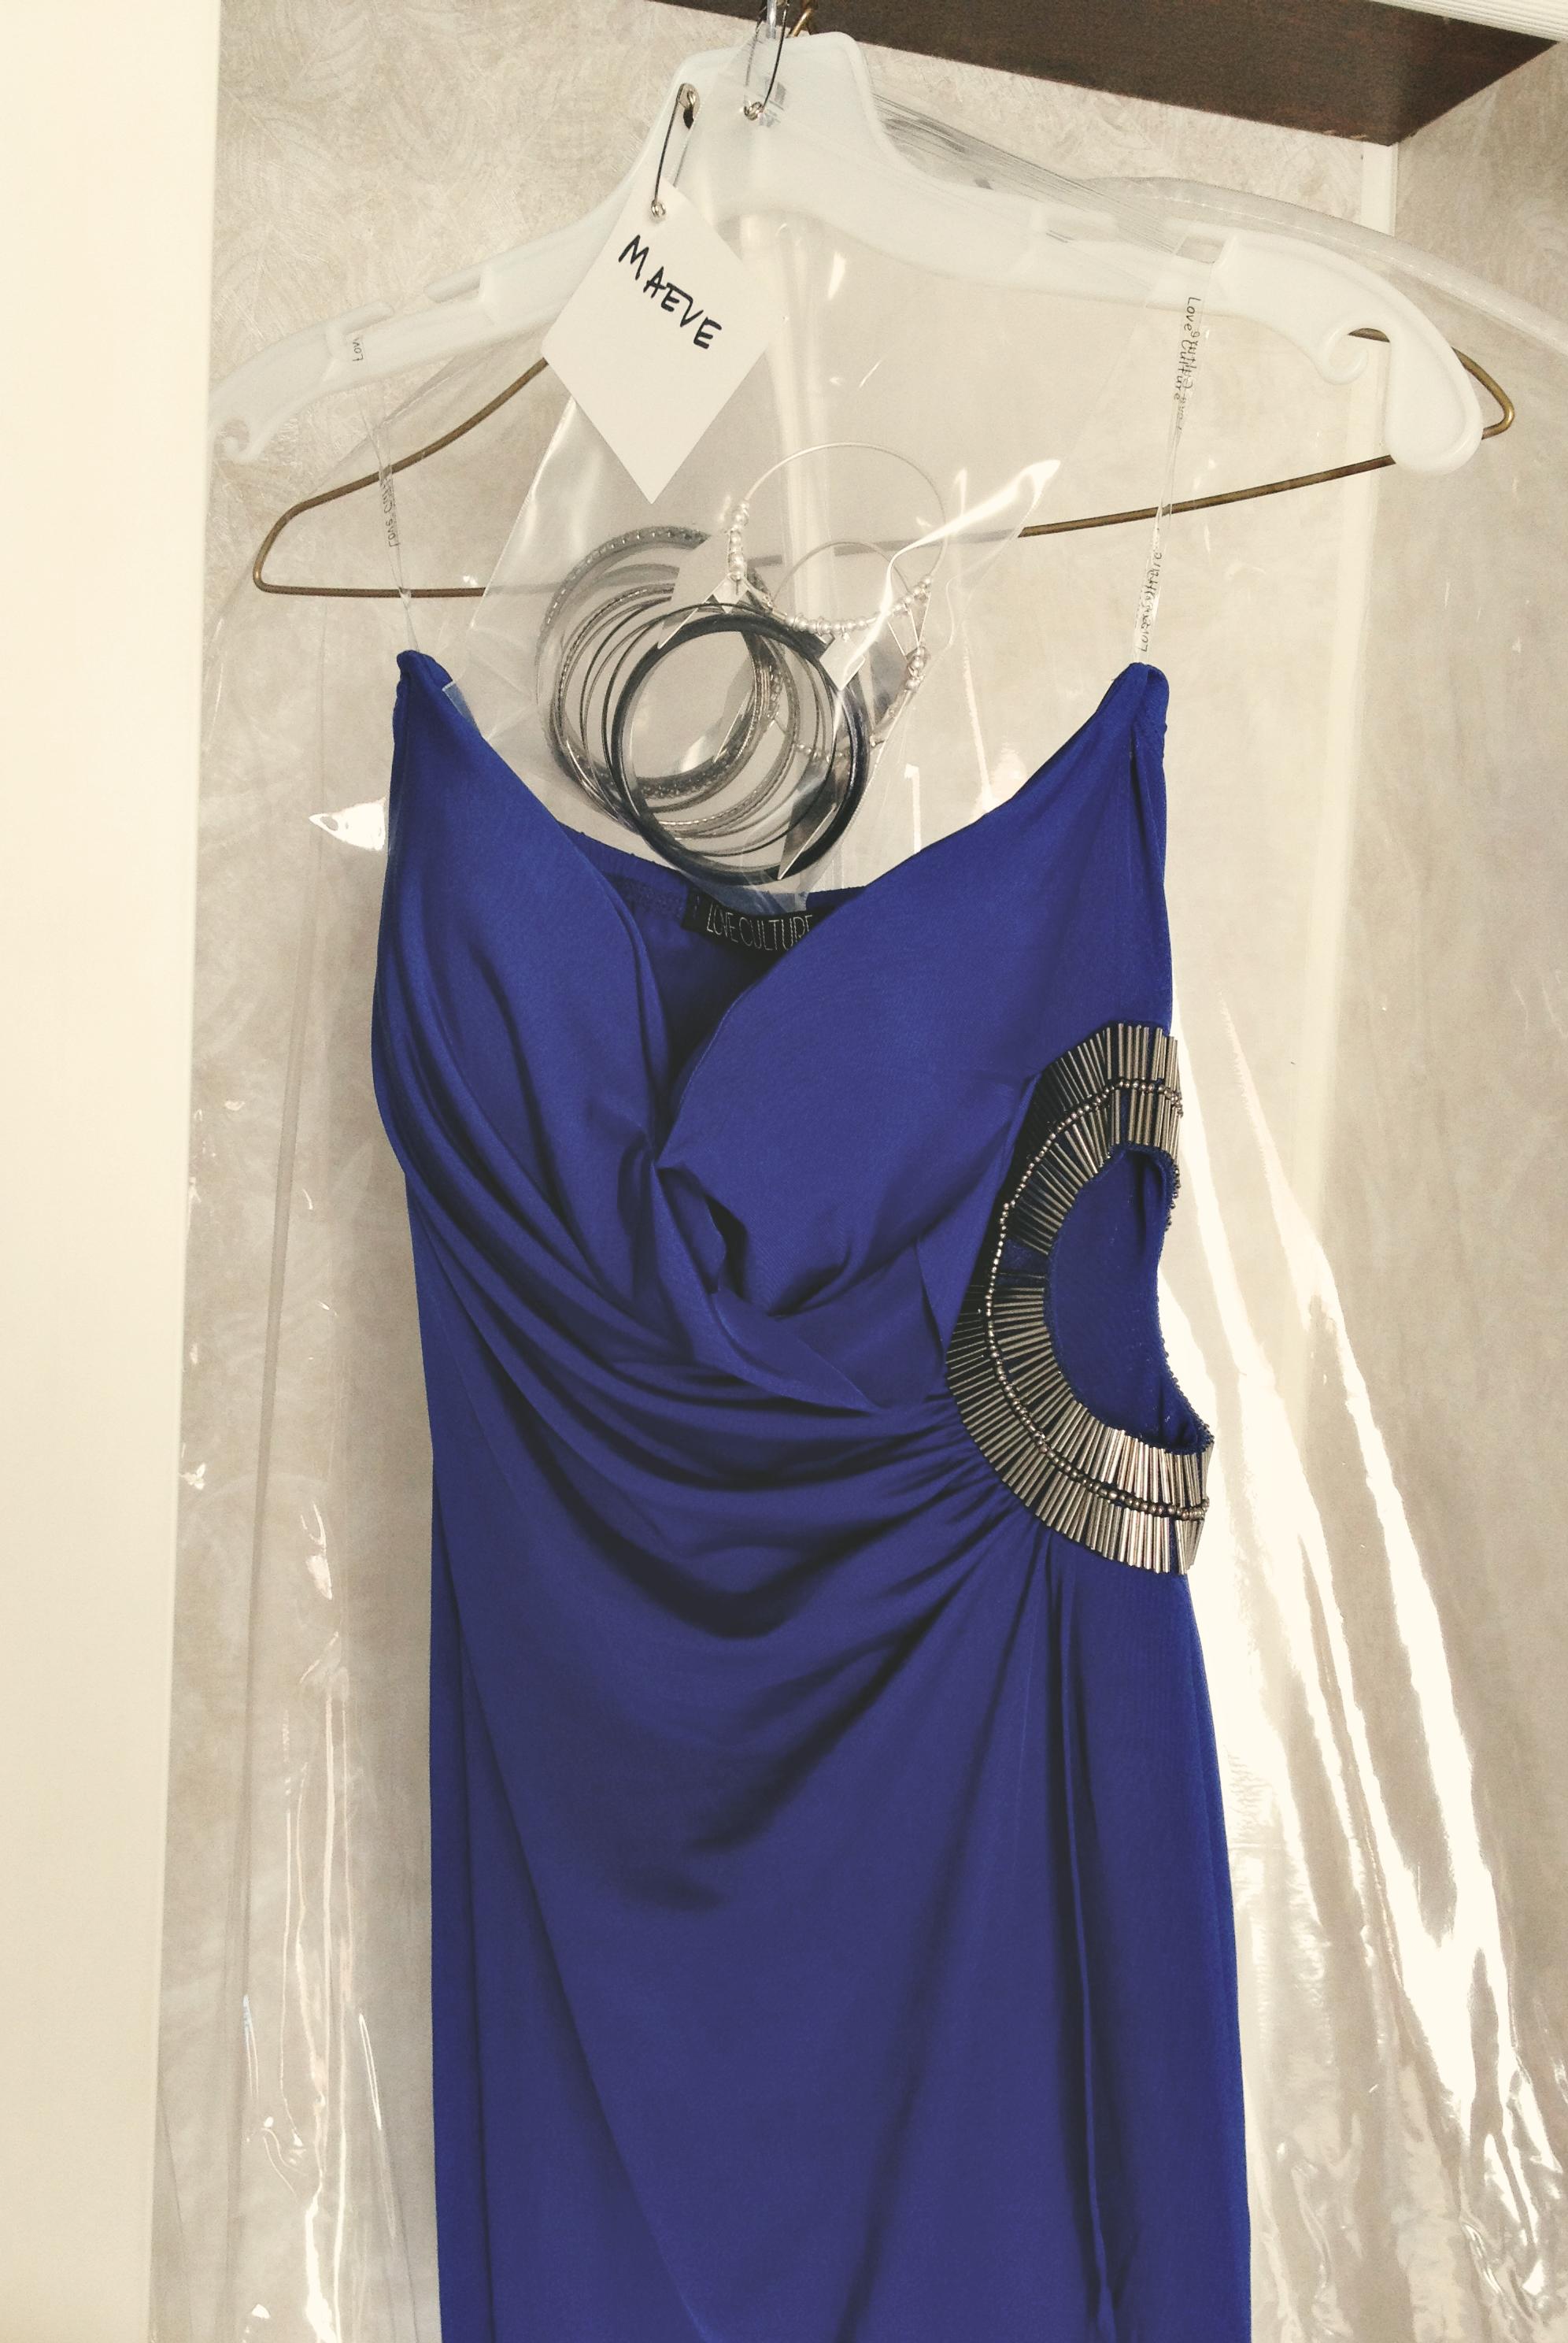 Wardrobe | Girl x Garment